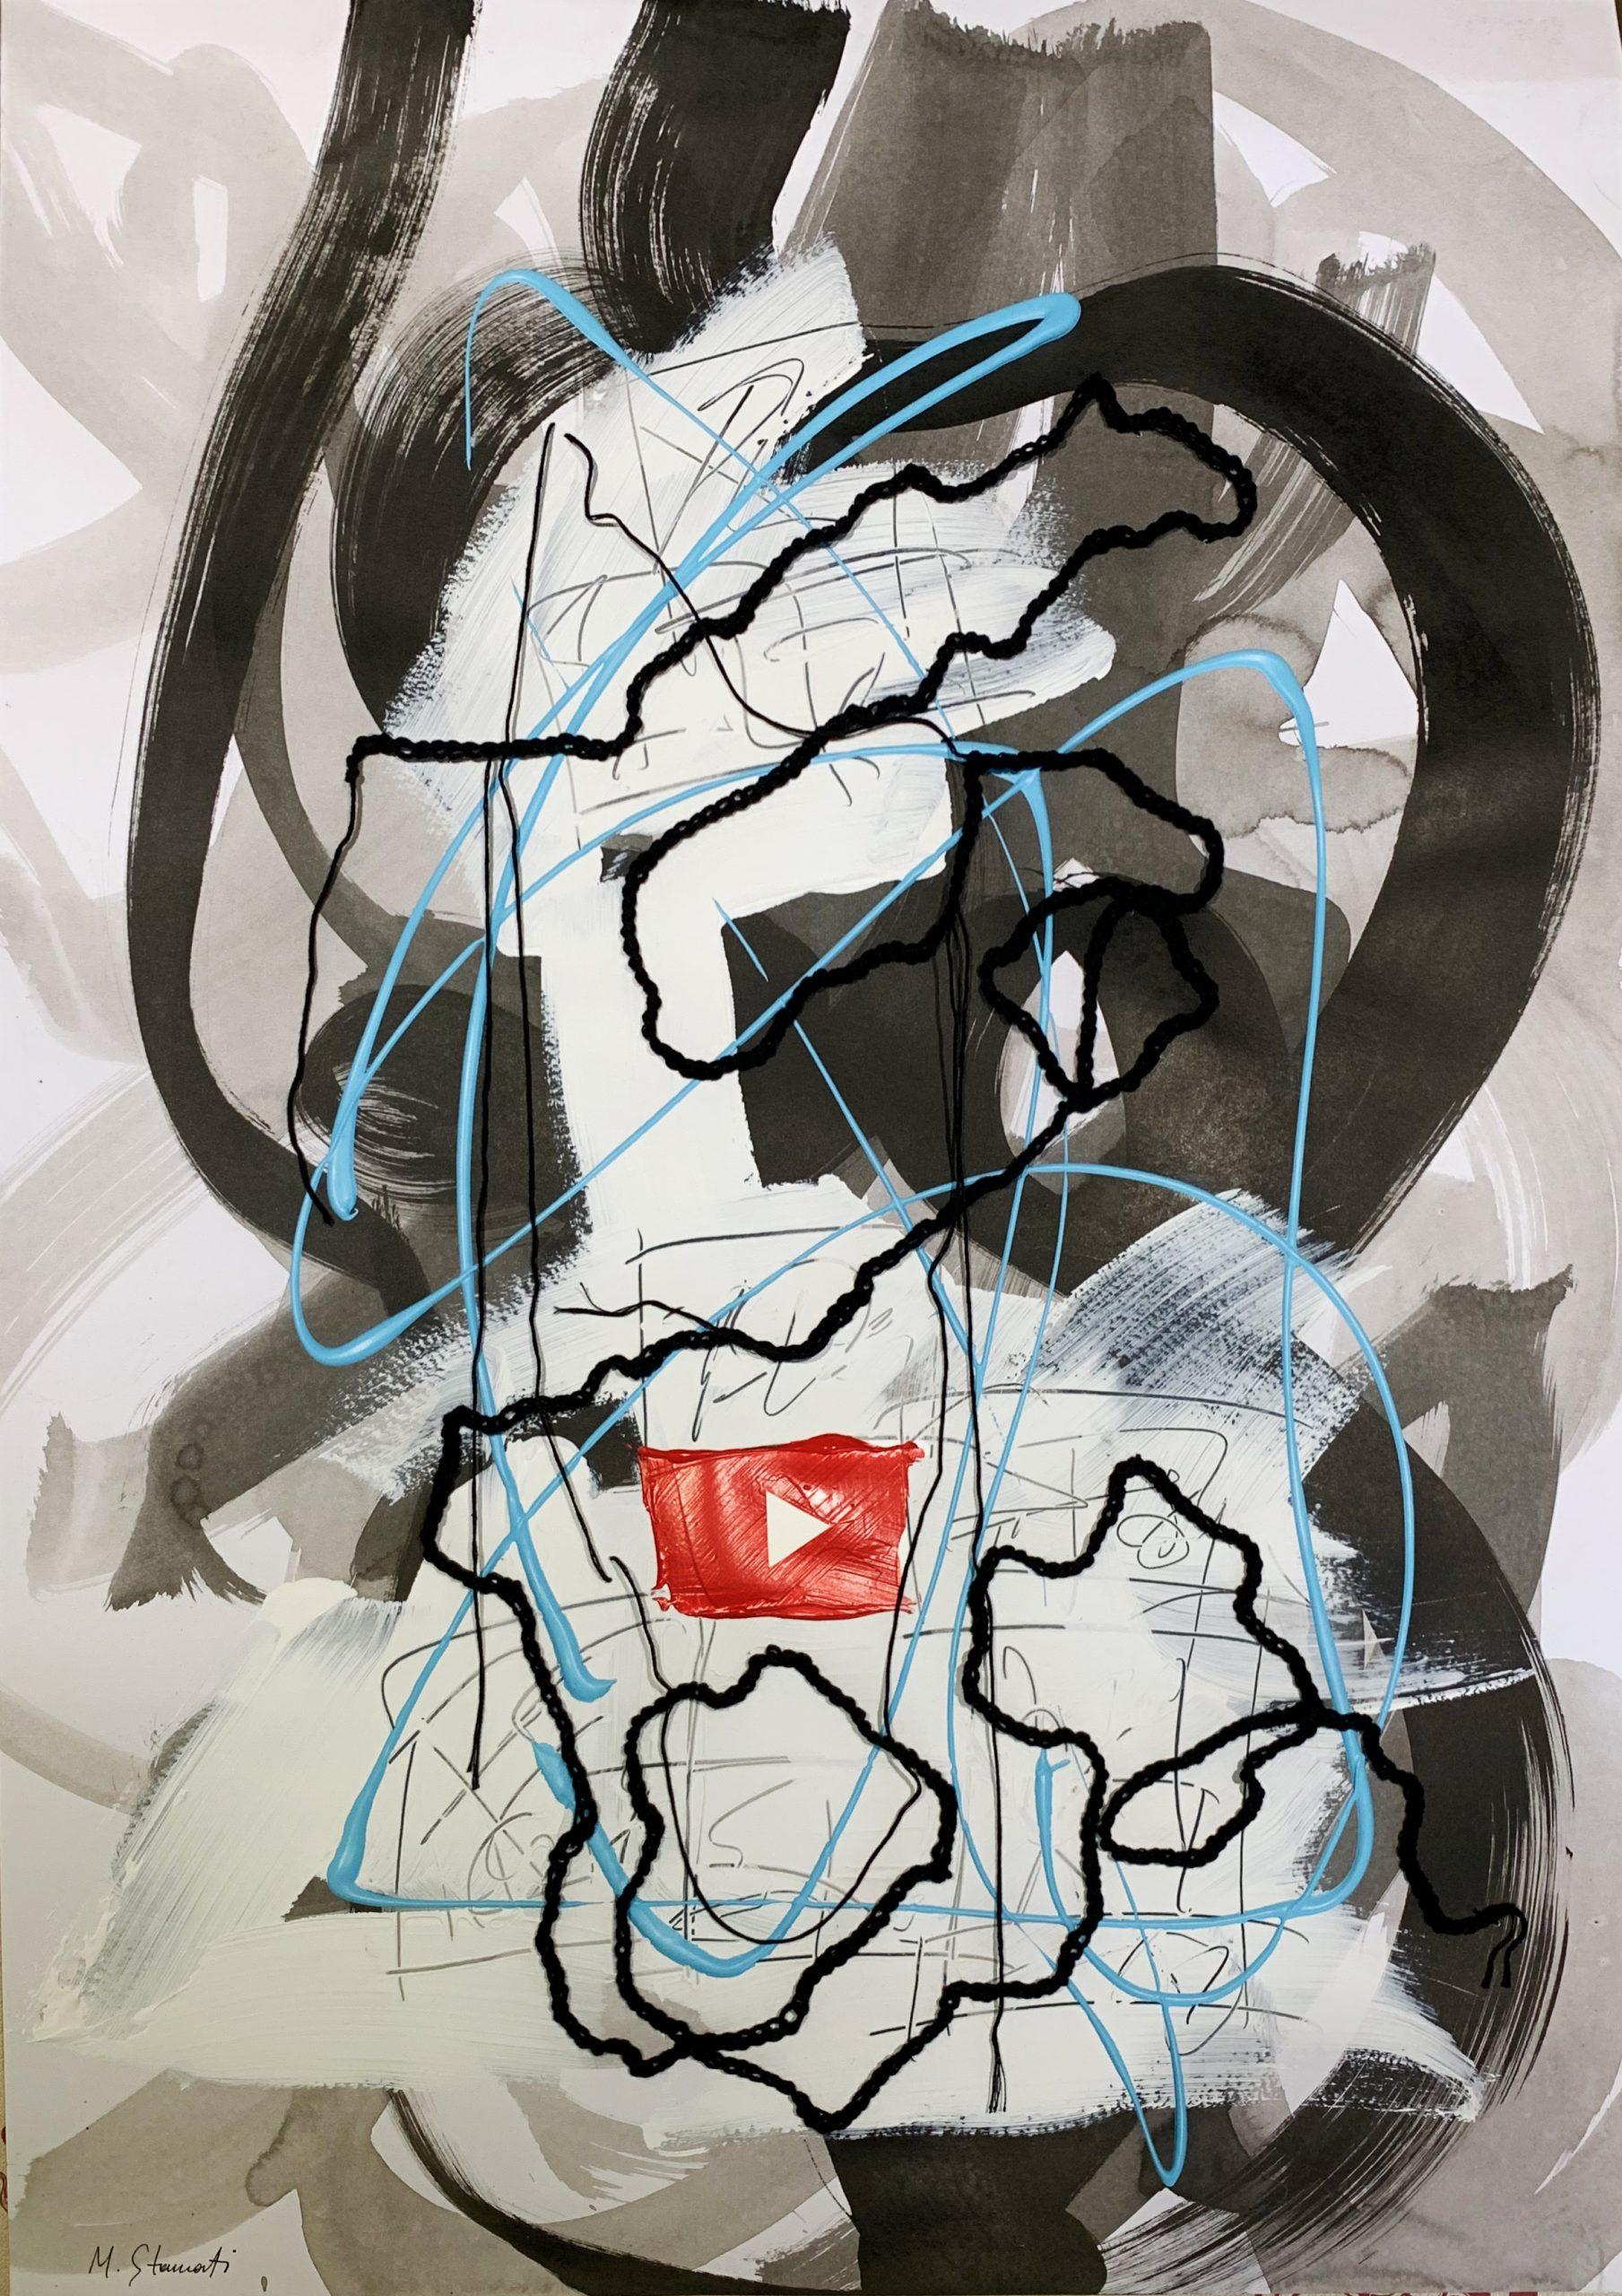 Maria Stamati - Untitled